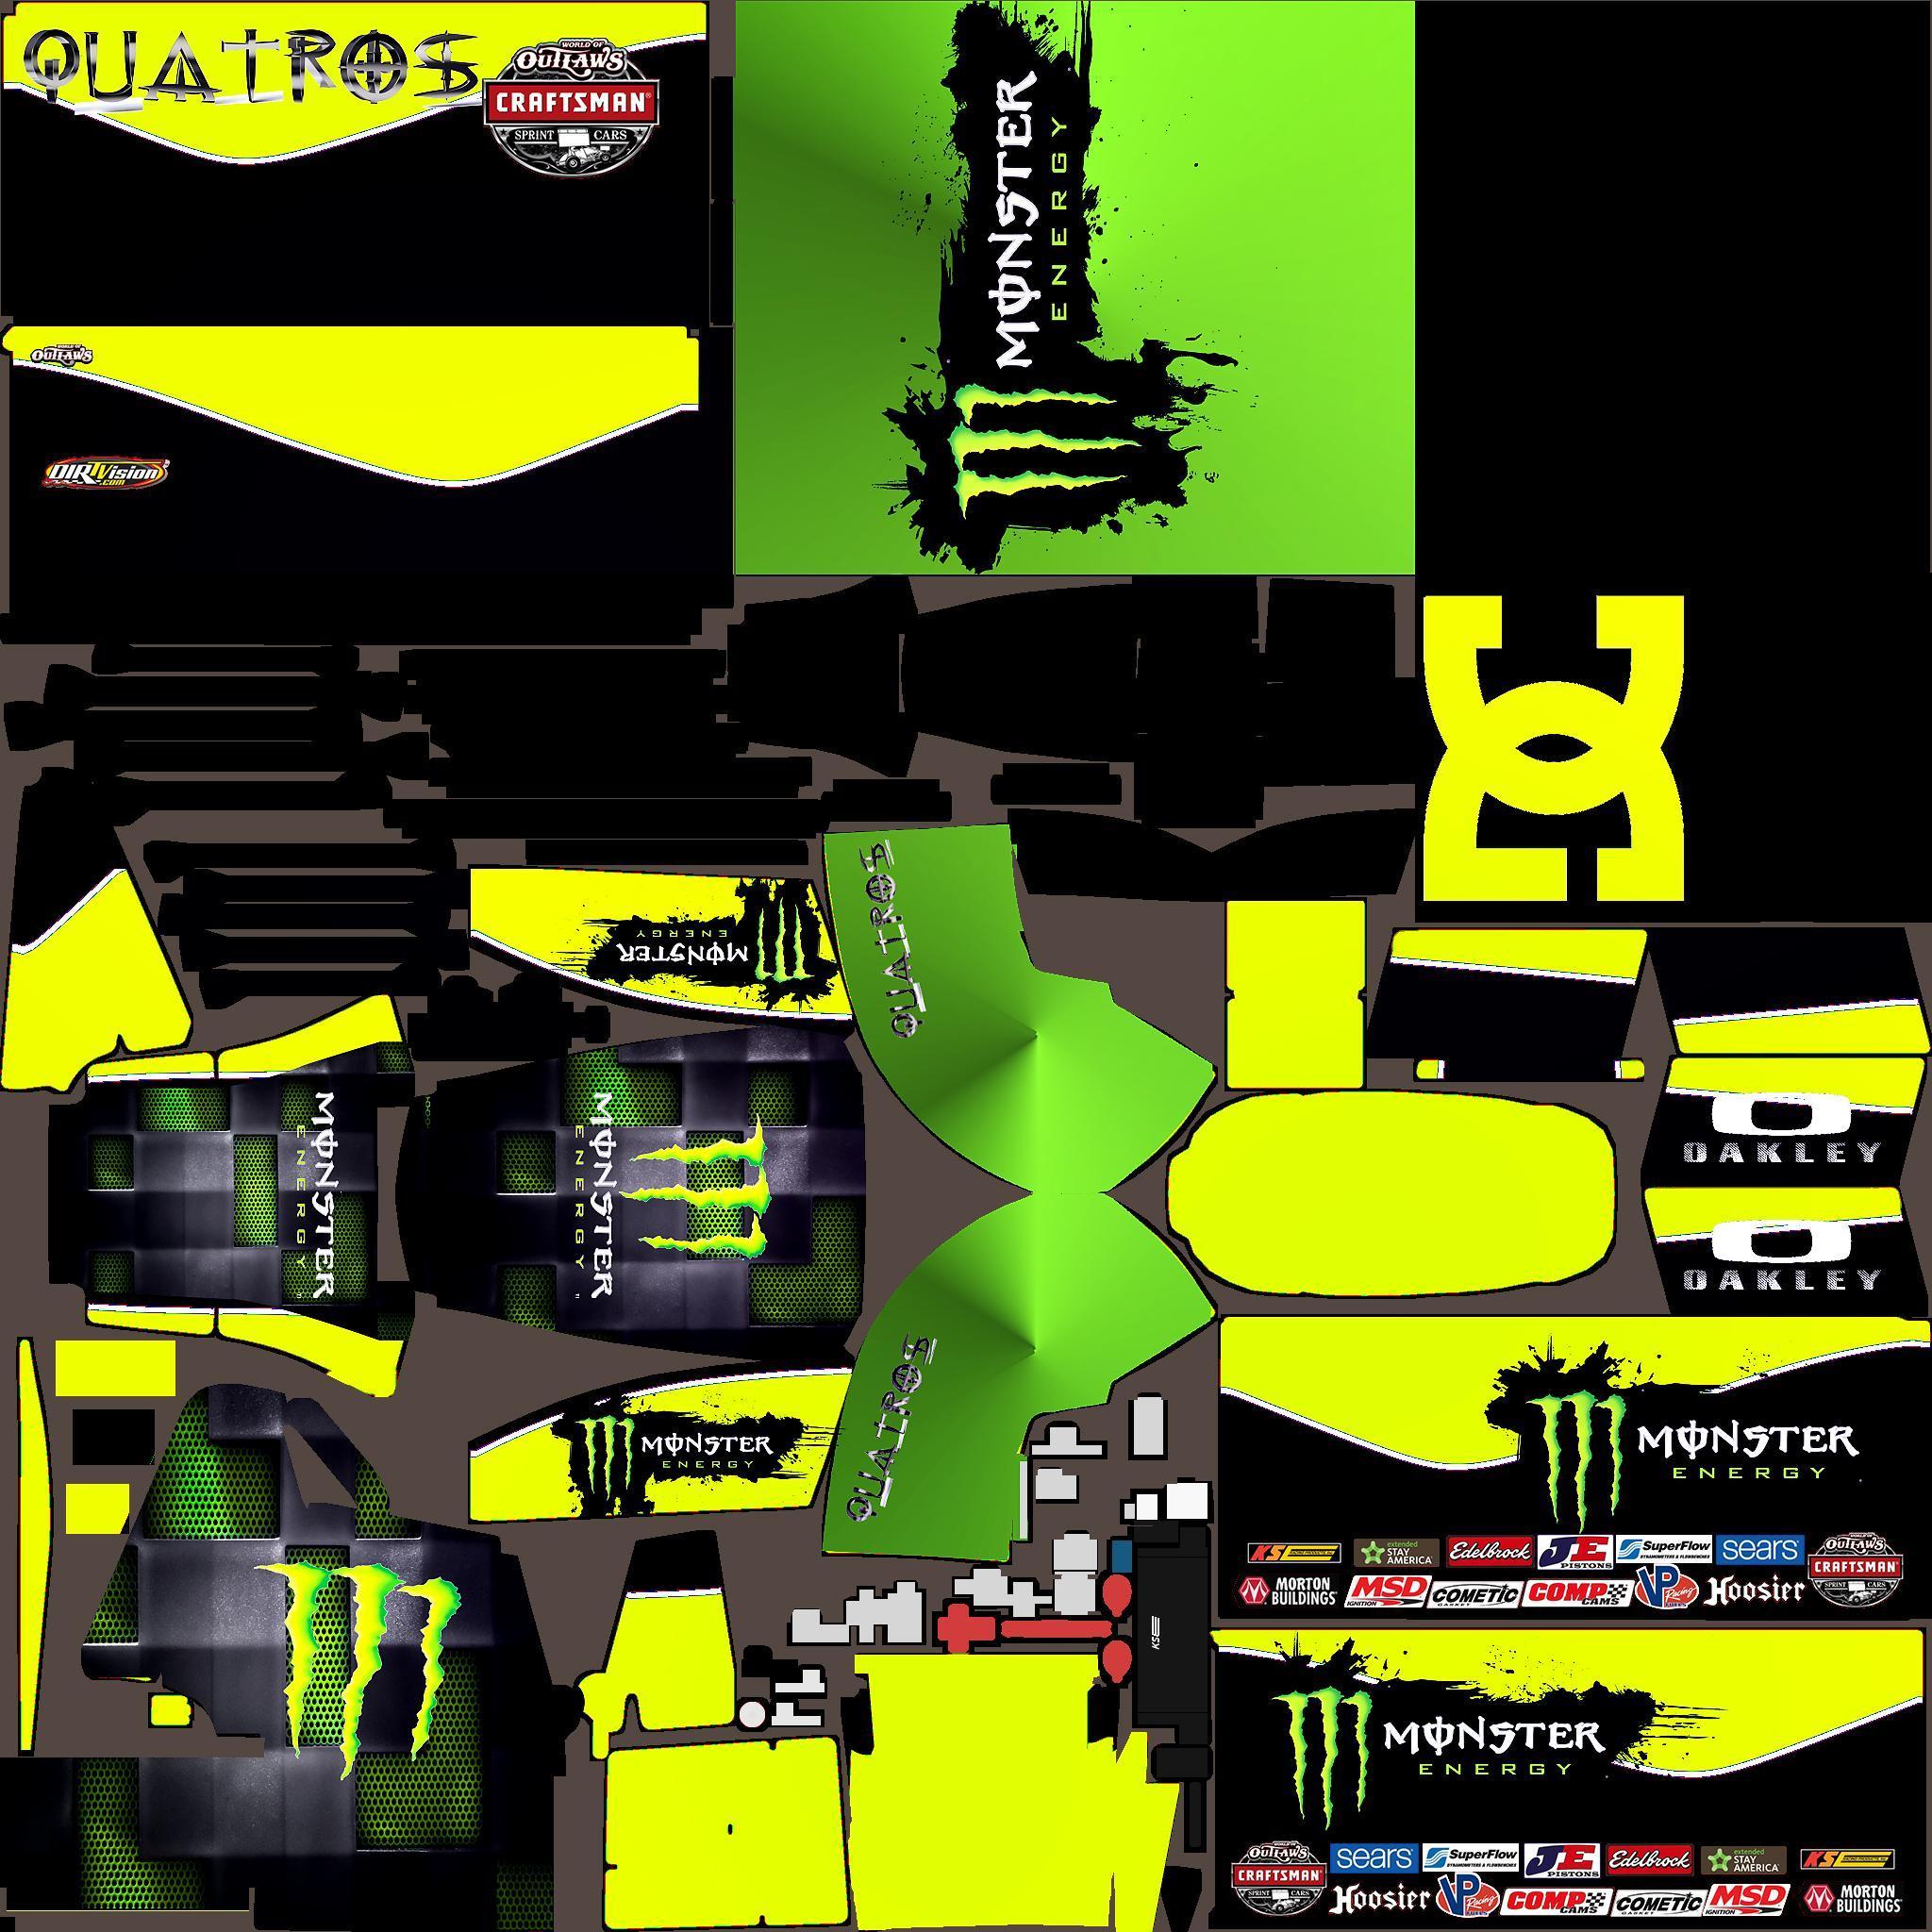 Monster energy dirt sprint car custom paint scheme by jose for Dirt track race car paint schemes